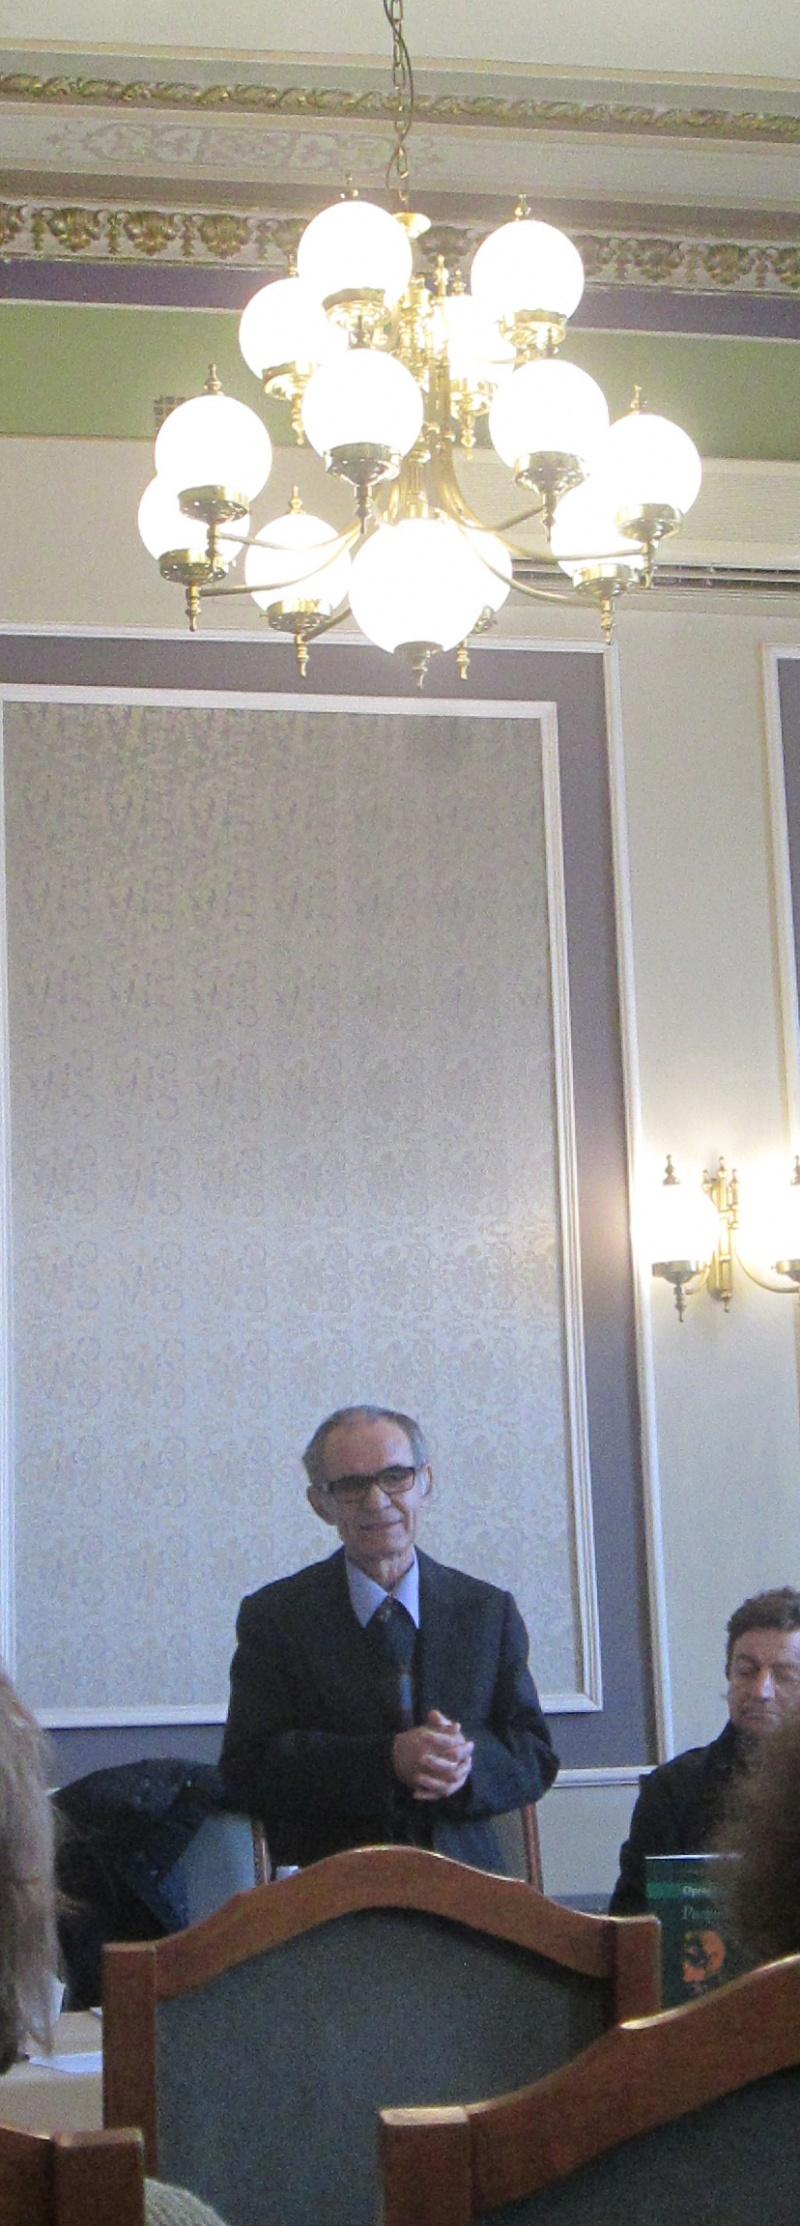 Moderatorul manifestării - conf. univ. George Popescu (Universitatea din Craiova)